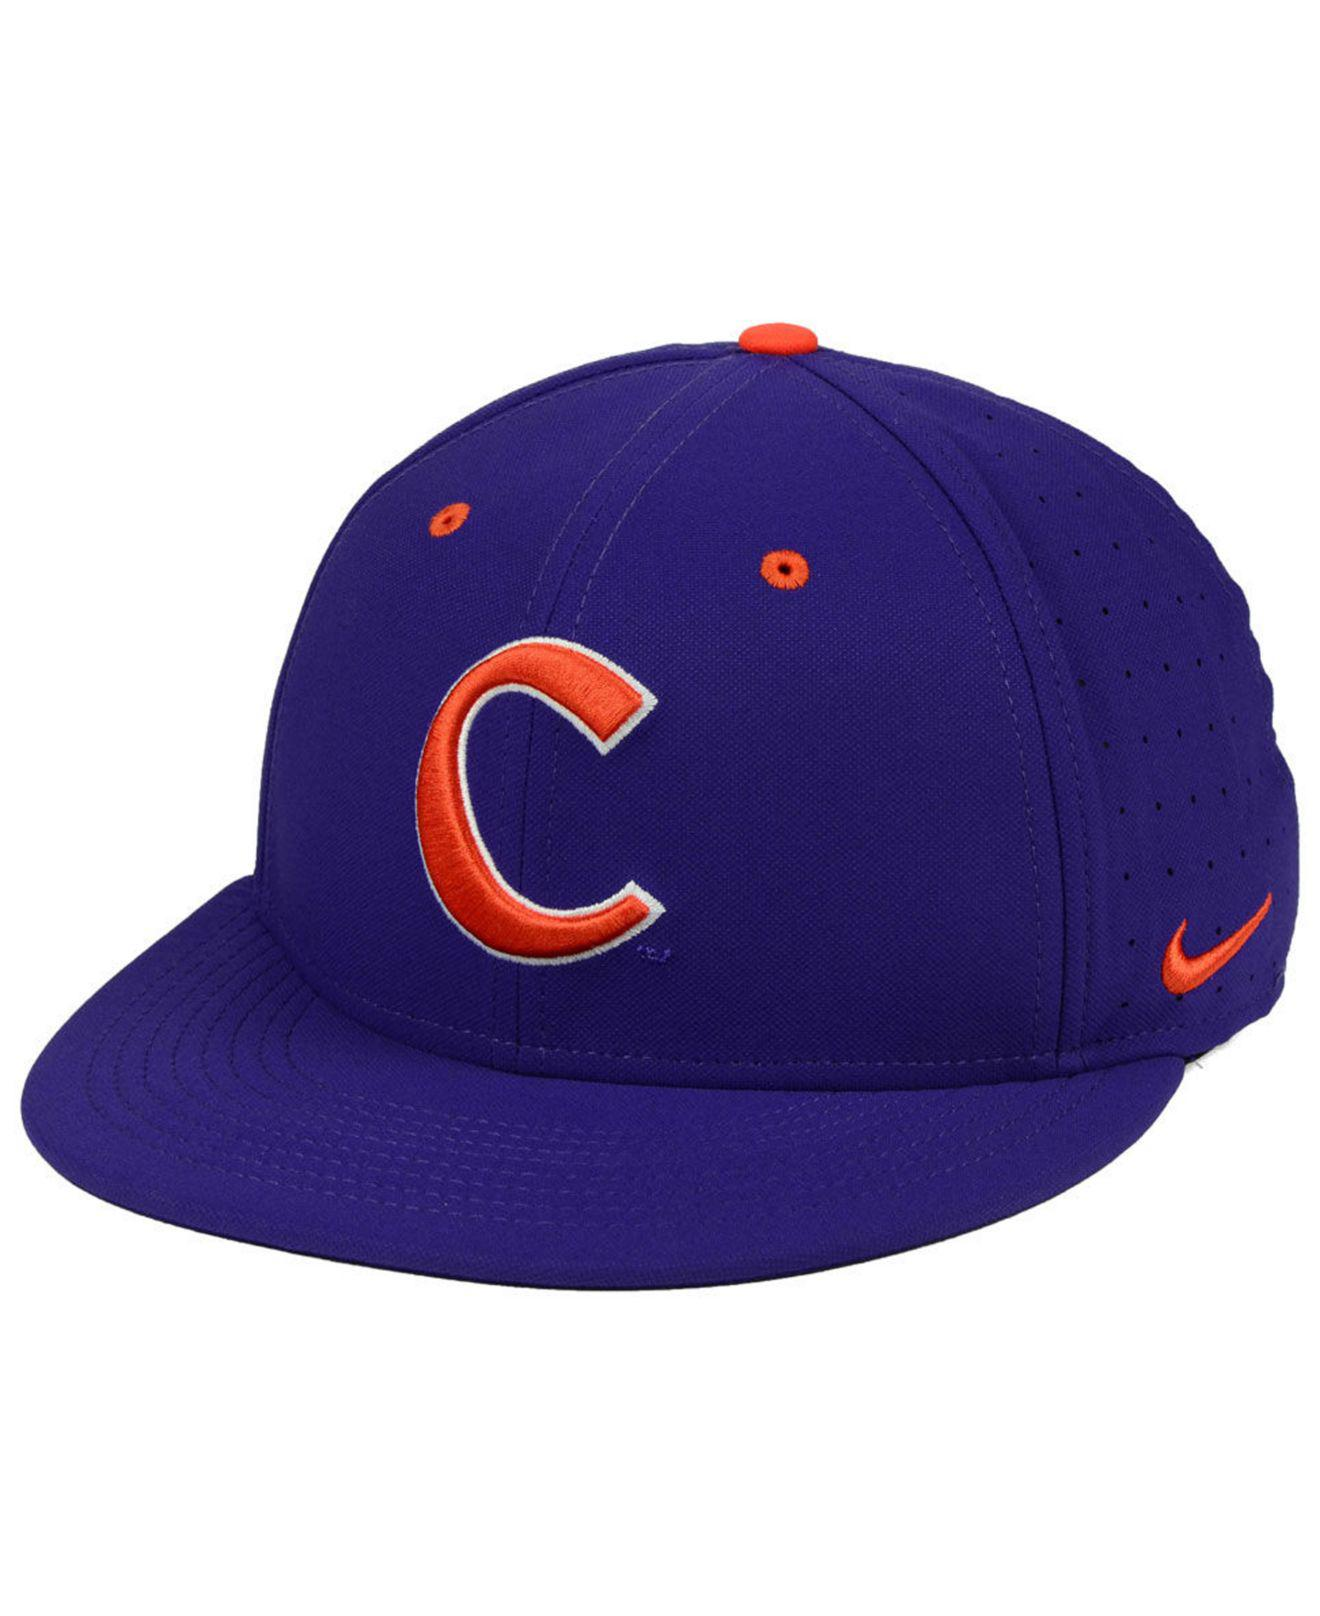 48b97c084fdcd Lyst - Nike Clemson Tigers Aerobill True Fitted Baseball Cap in ...